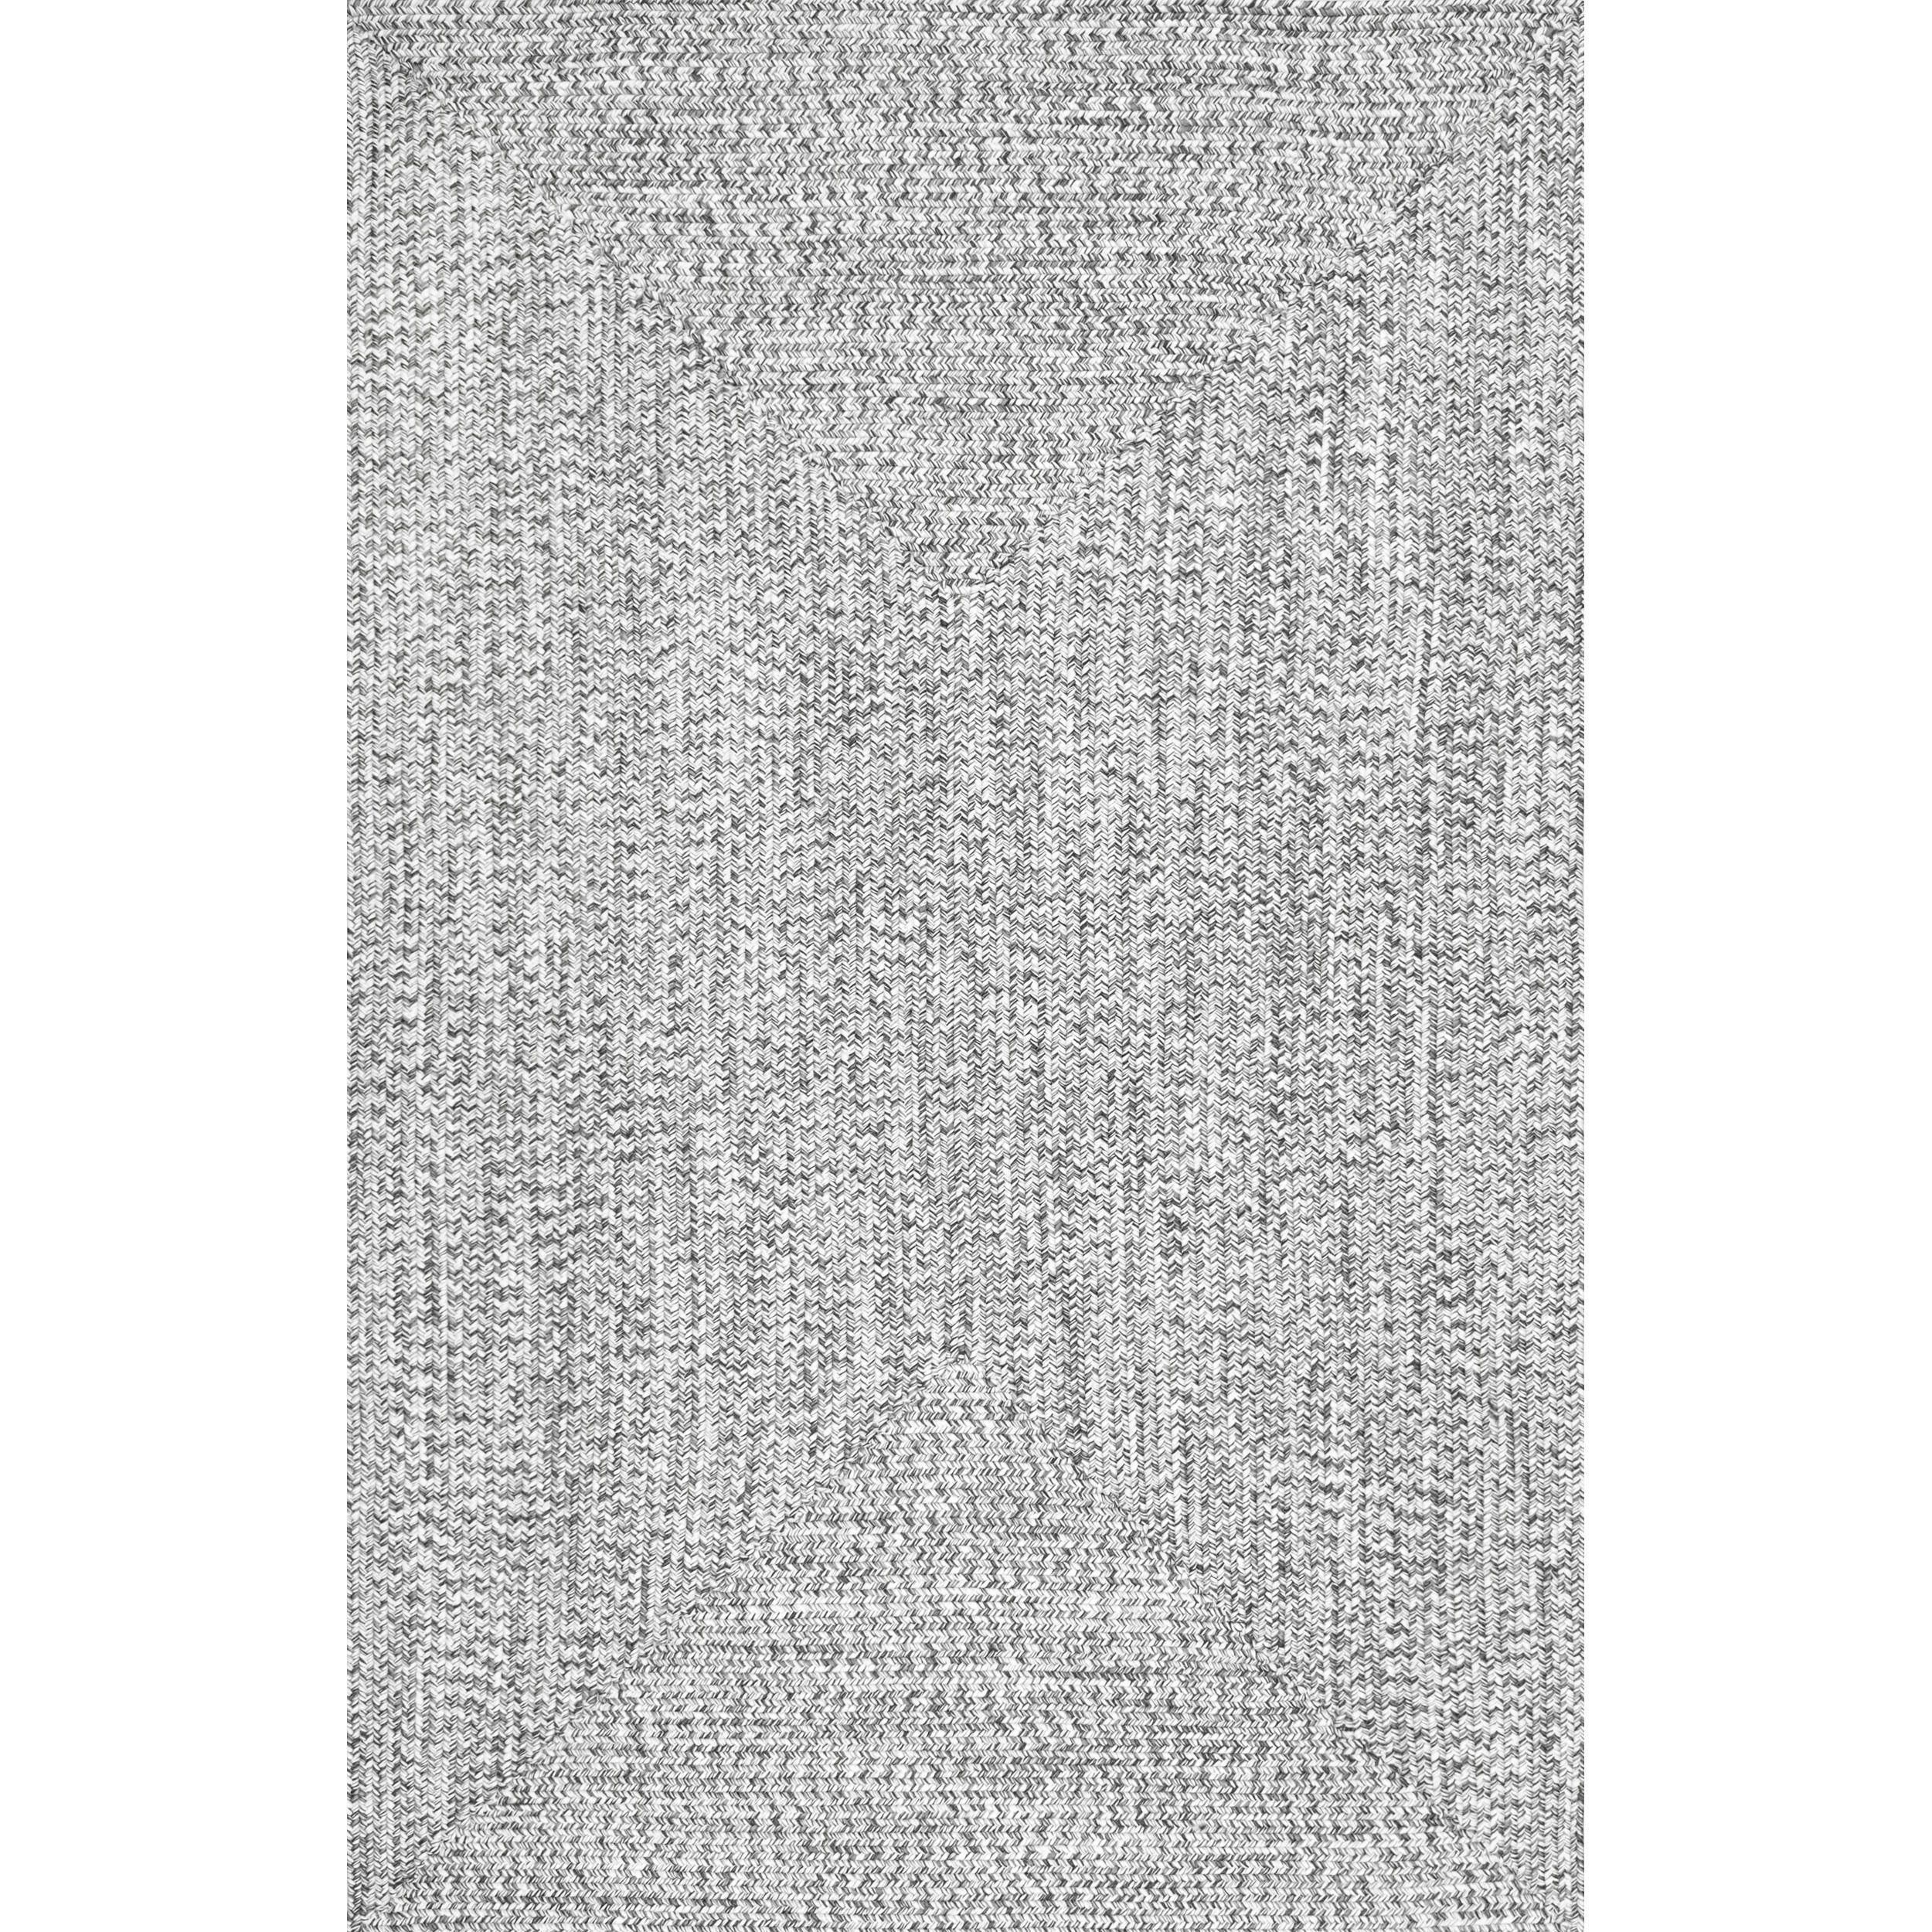 Nuloom handmade casual braided blue indoor outdoor rug 86 x 116 light grey polypropylene solid